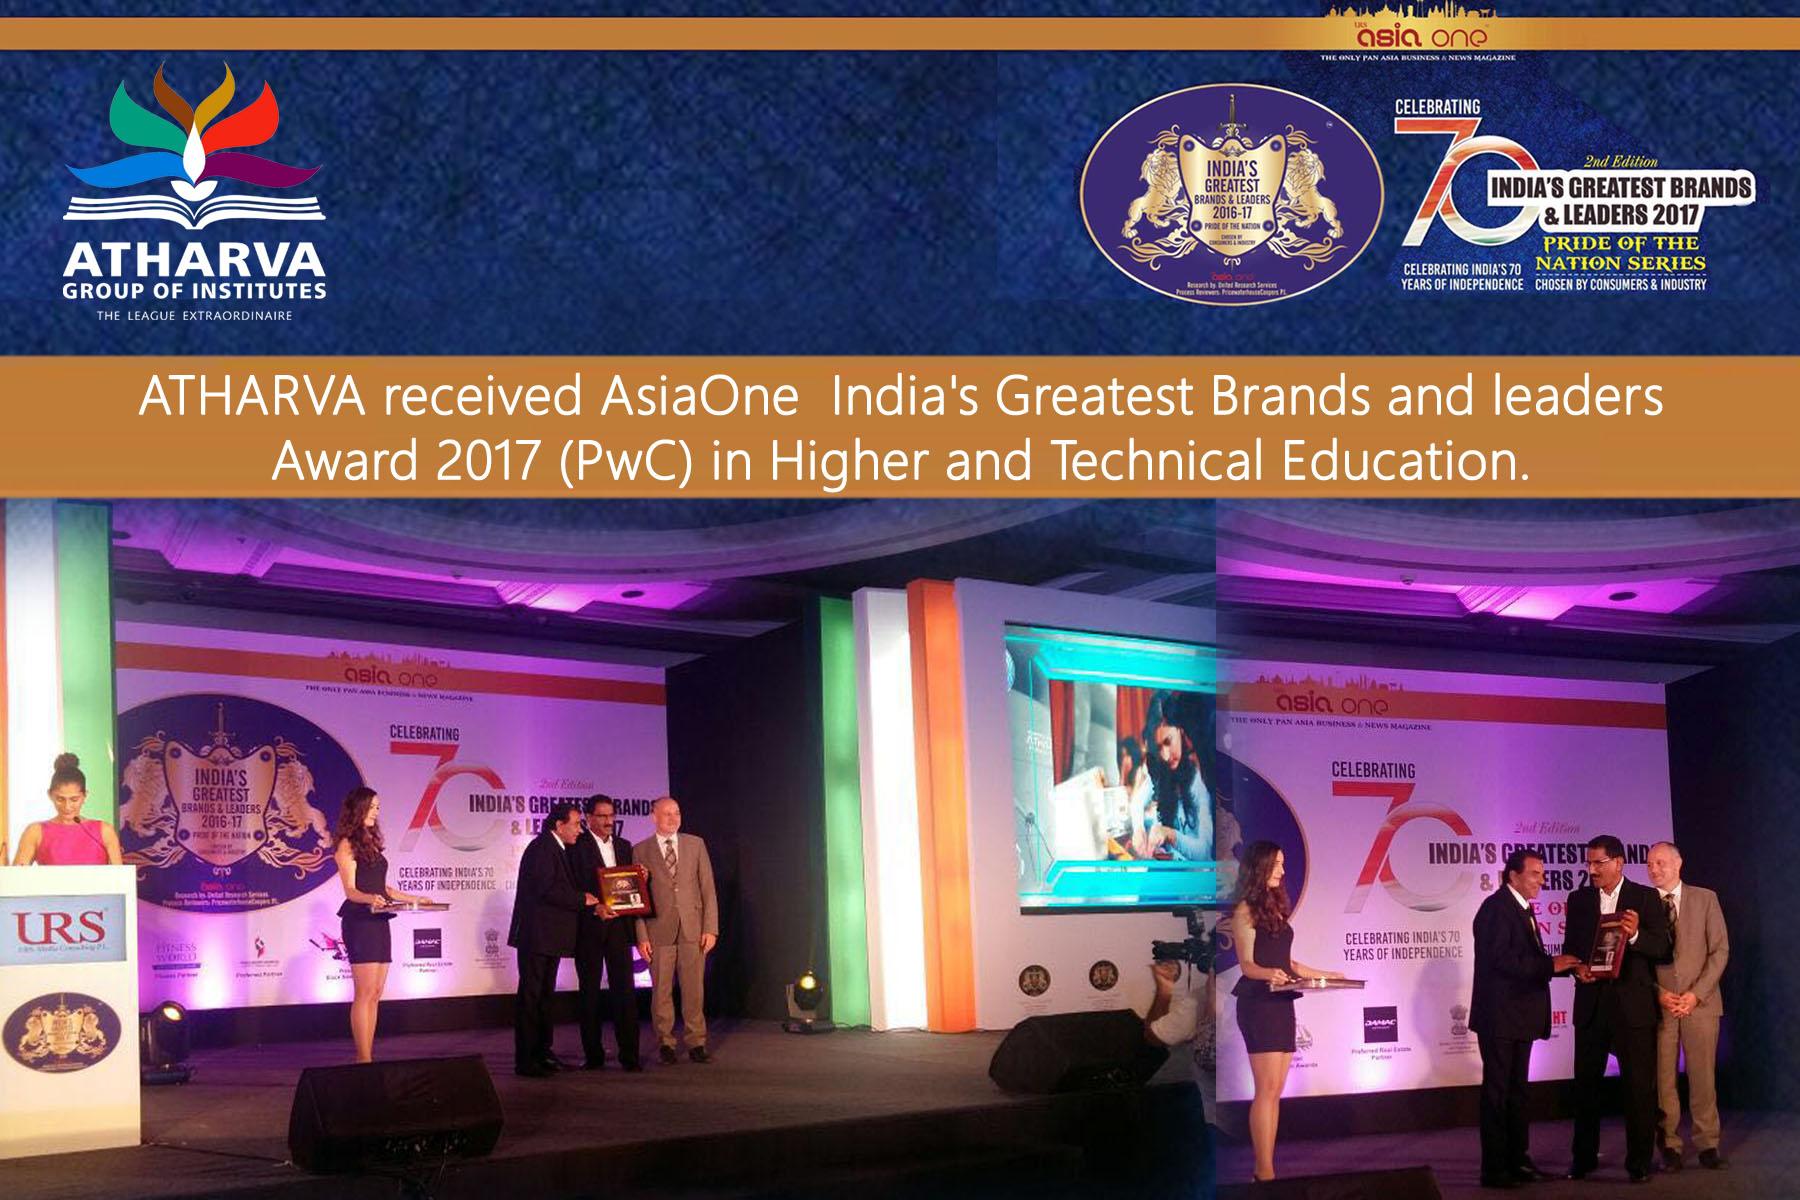 Shri-Sunil-Rane-winning-the-Indias-Greatest-Leader-Award